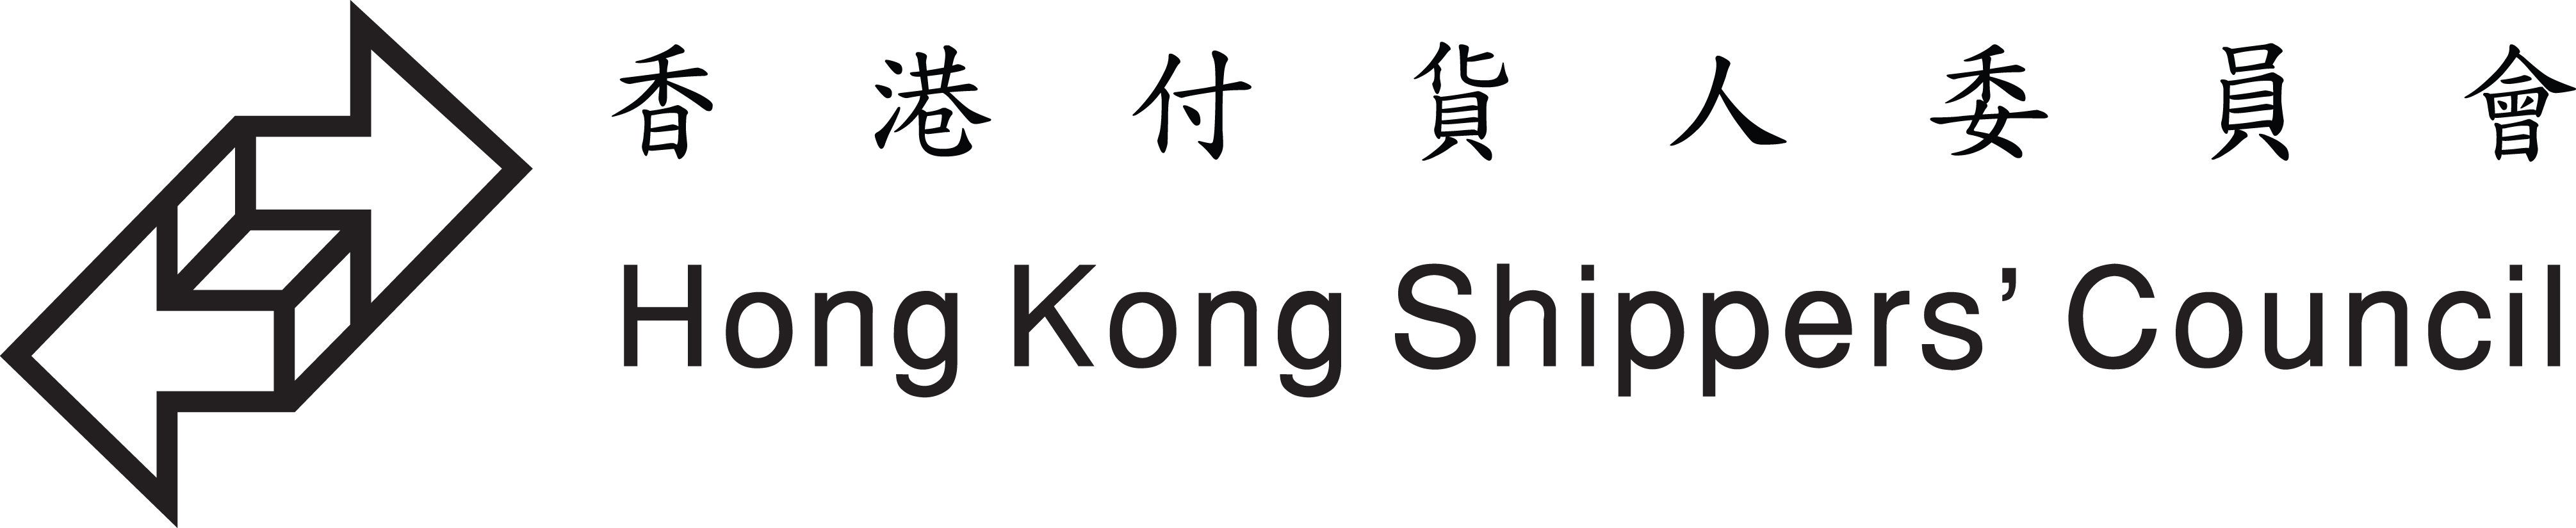 HKSC Logo